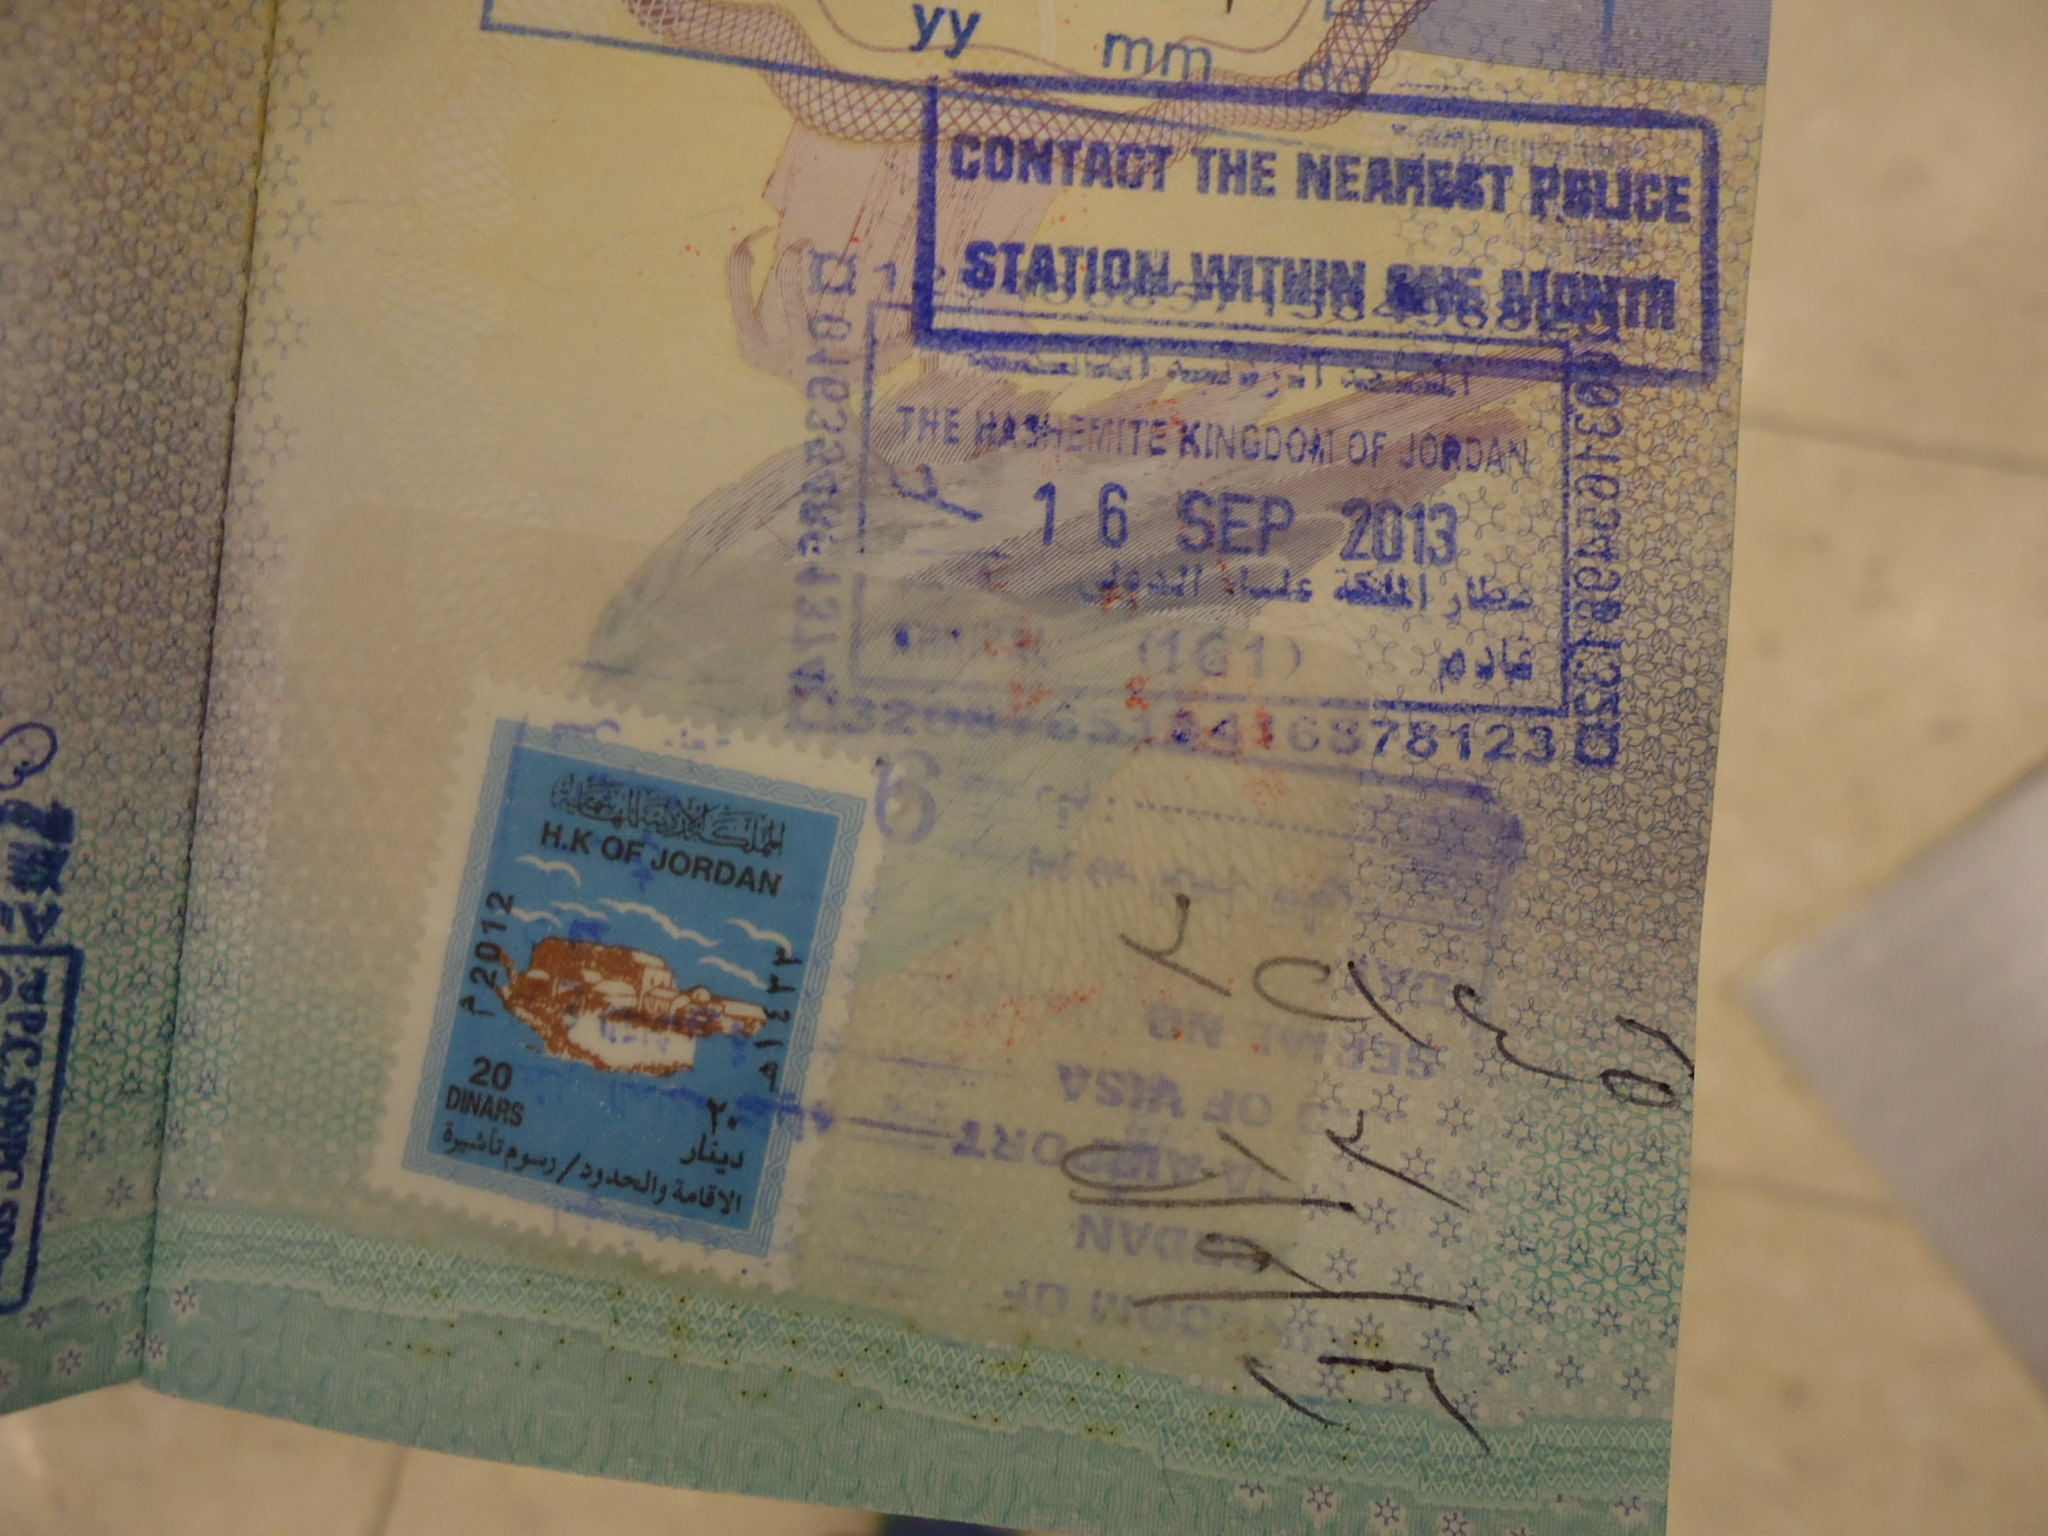 jordan visa on arrival airport amman